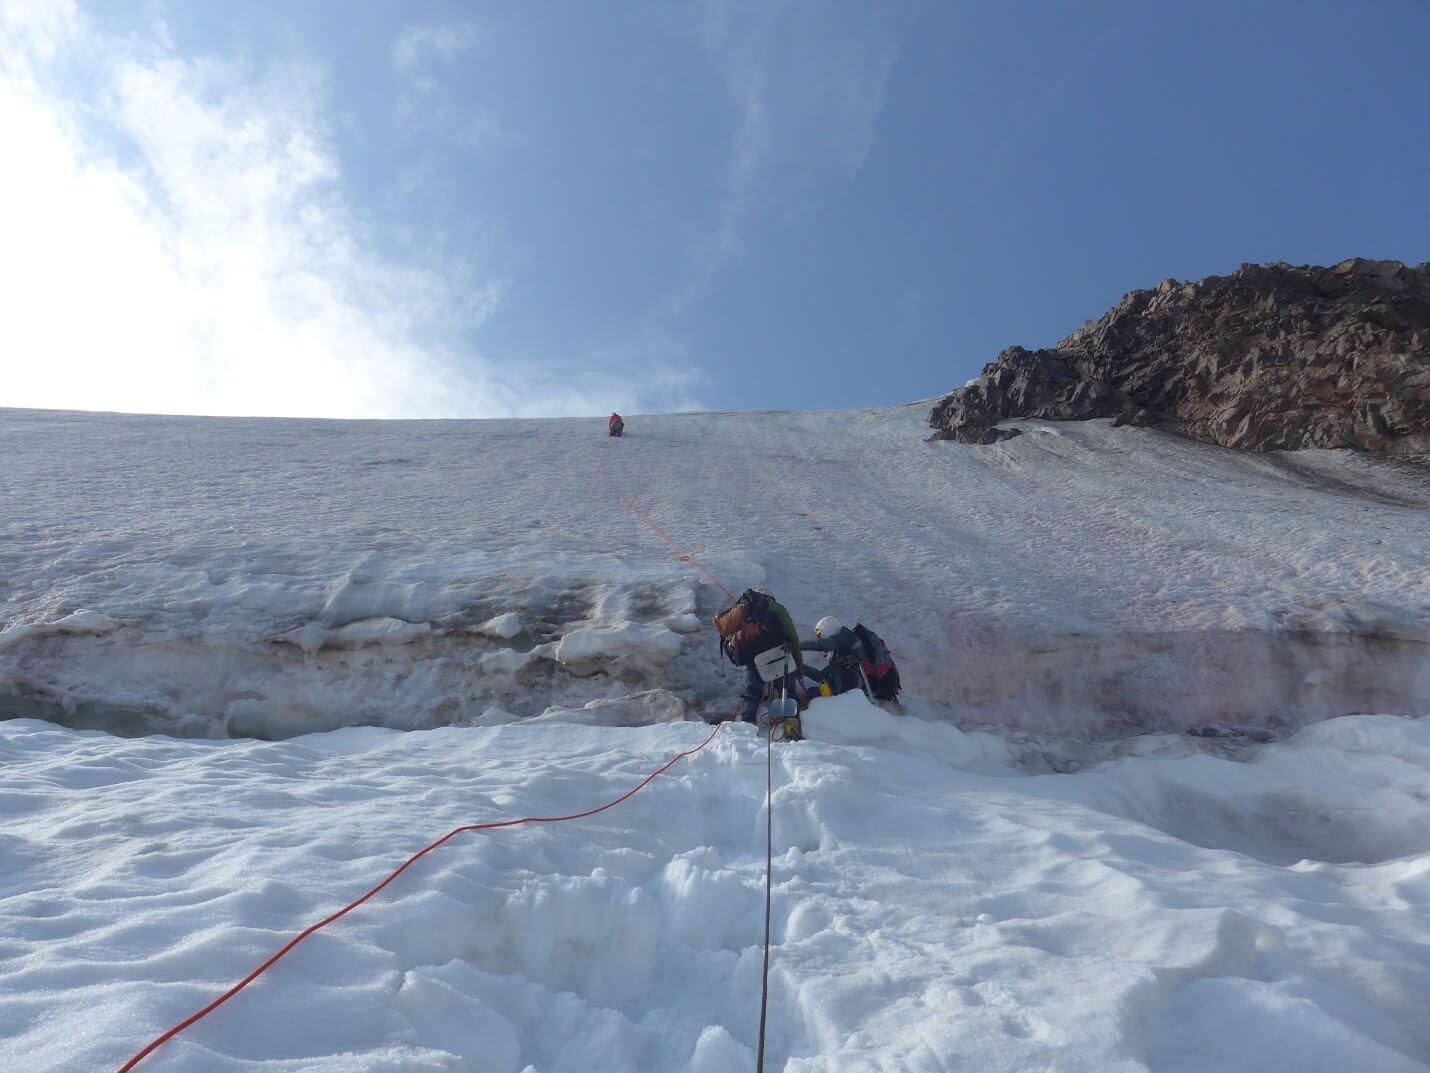 Отчет о горном маршруте 5 к.с. по Киргизскому хребту